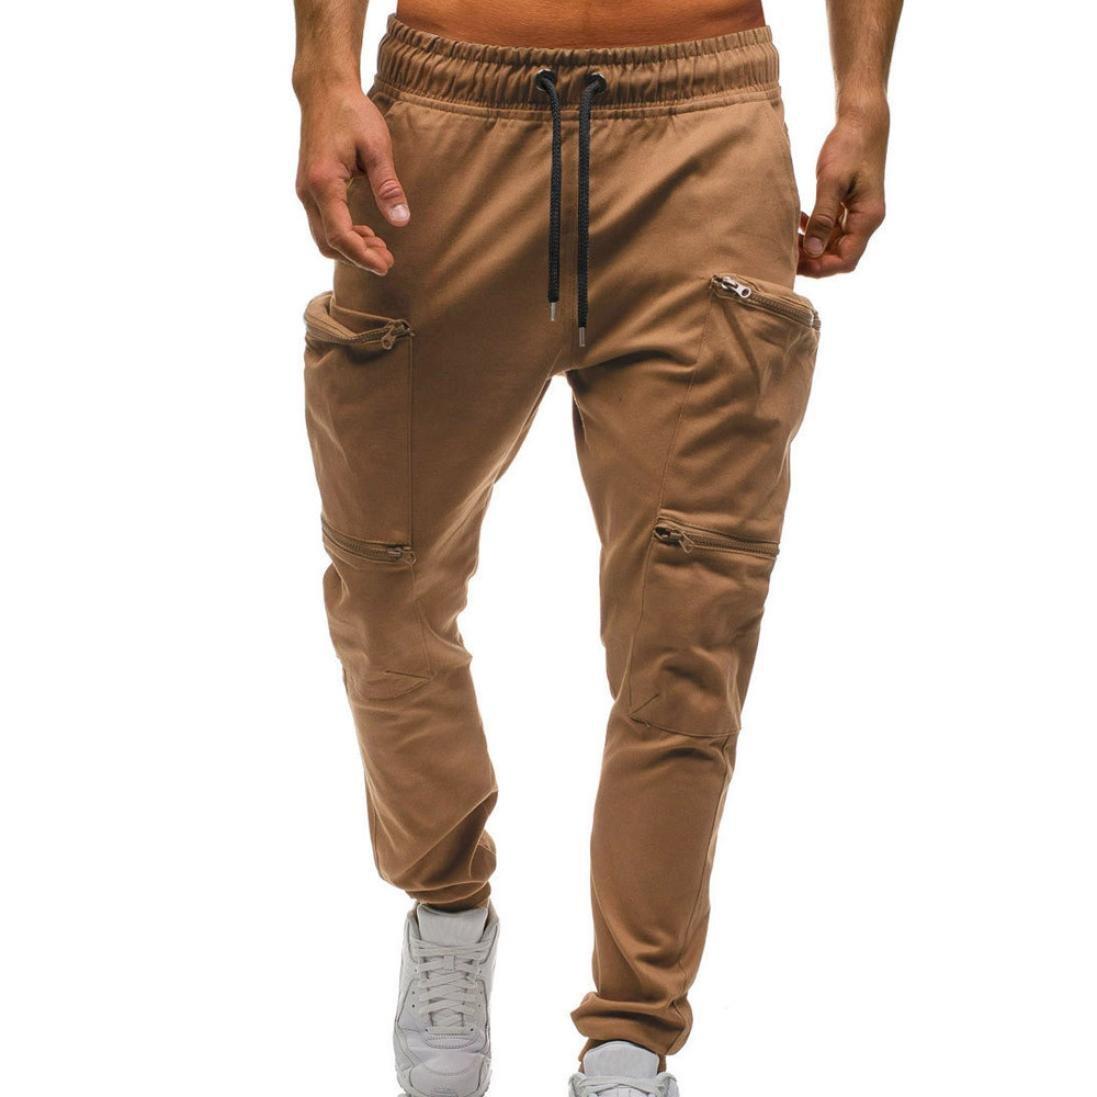 Realdo Men's Solid Casual Pants, Fashion Elastic Waist Drawstring Zipper Pockets Cargo Pants